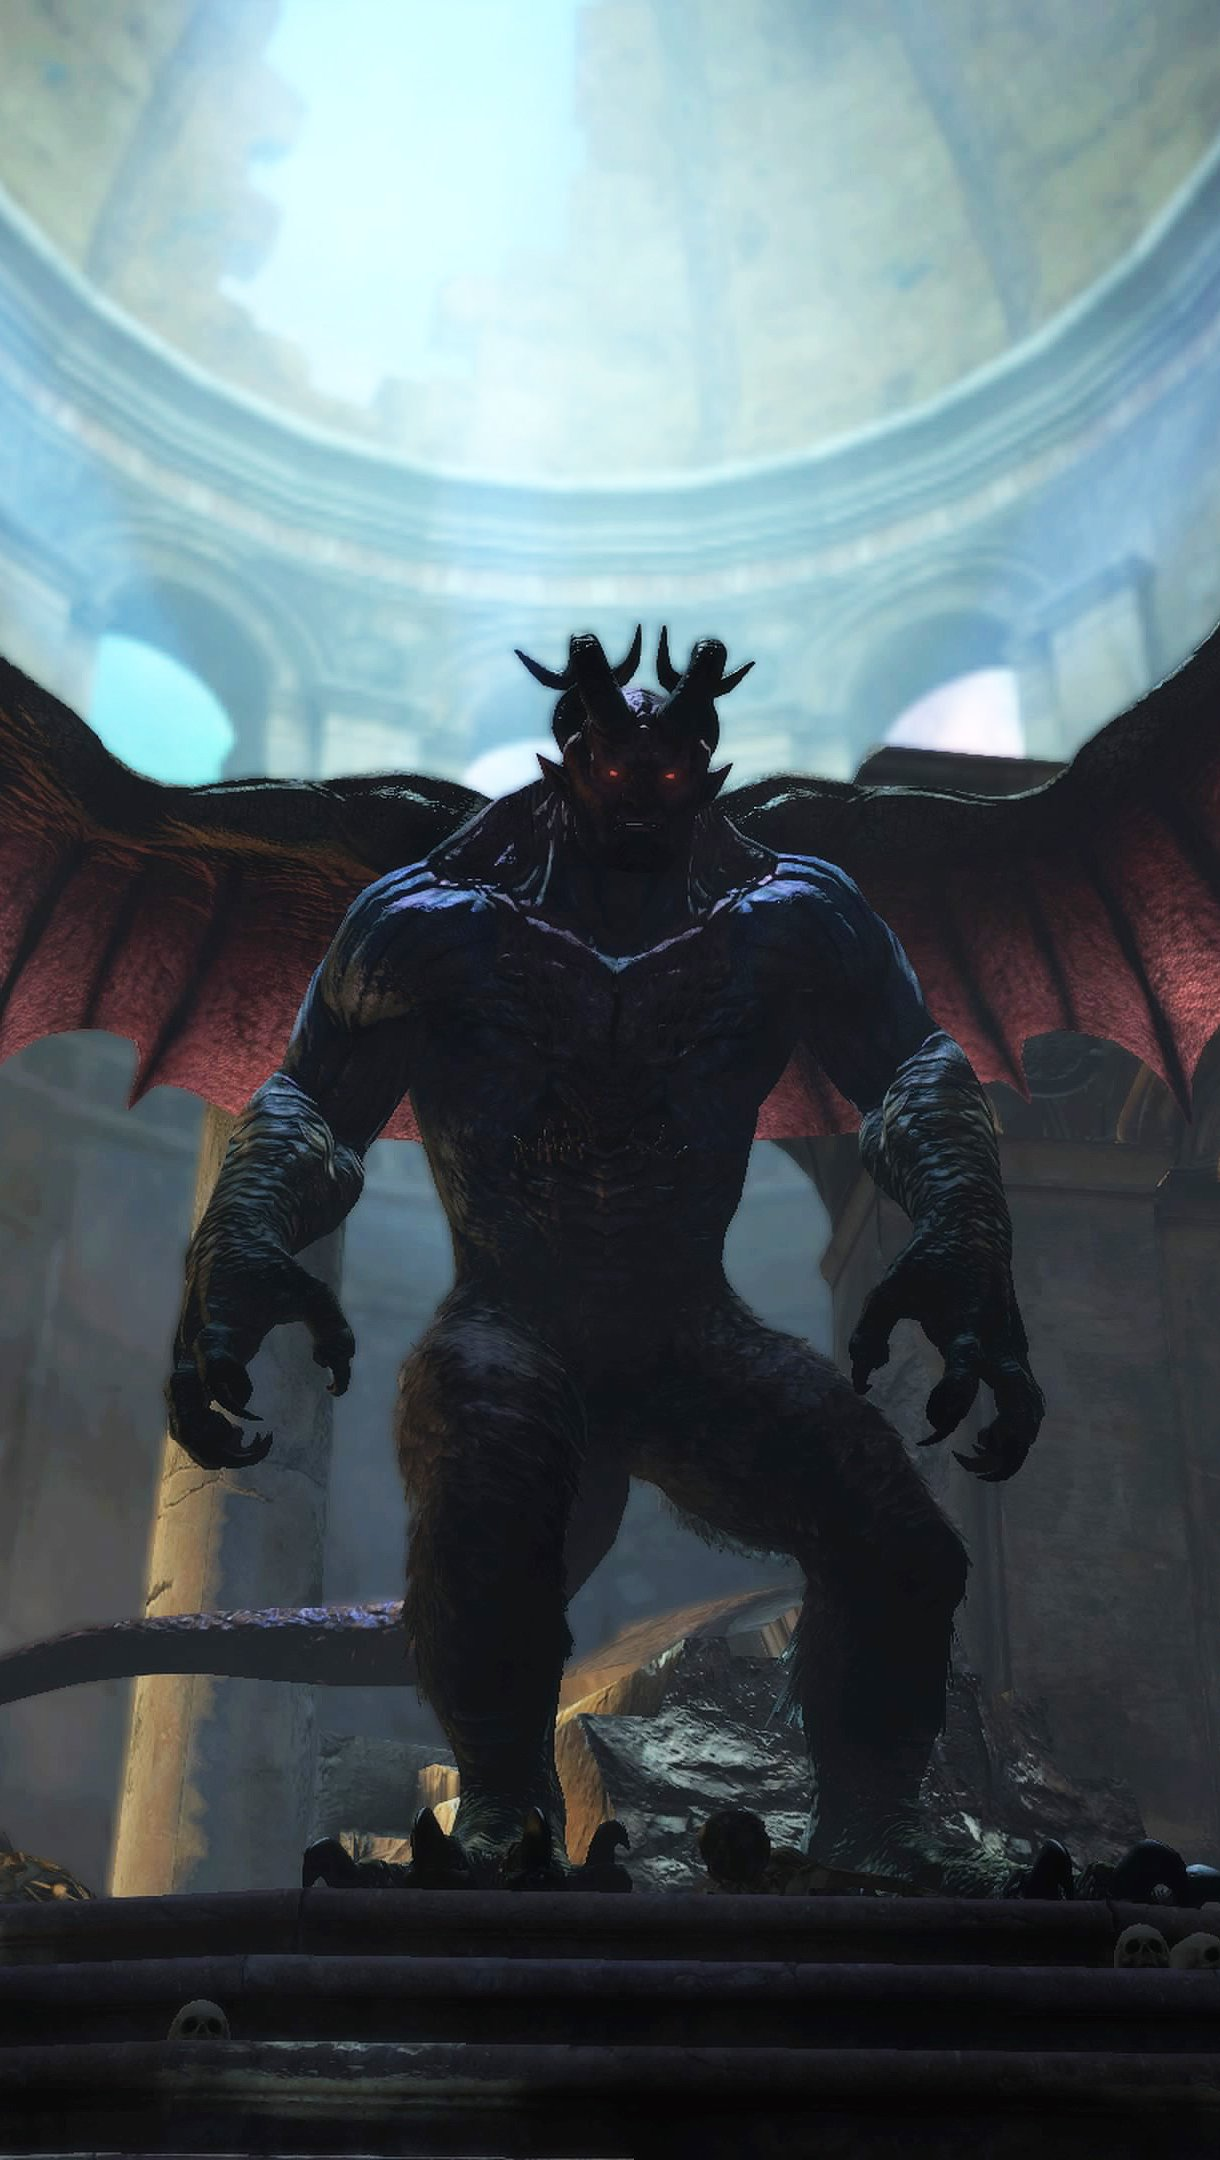 Fondos de pantalla Dragons Dogma Dark Arisen Vertical